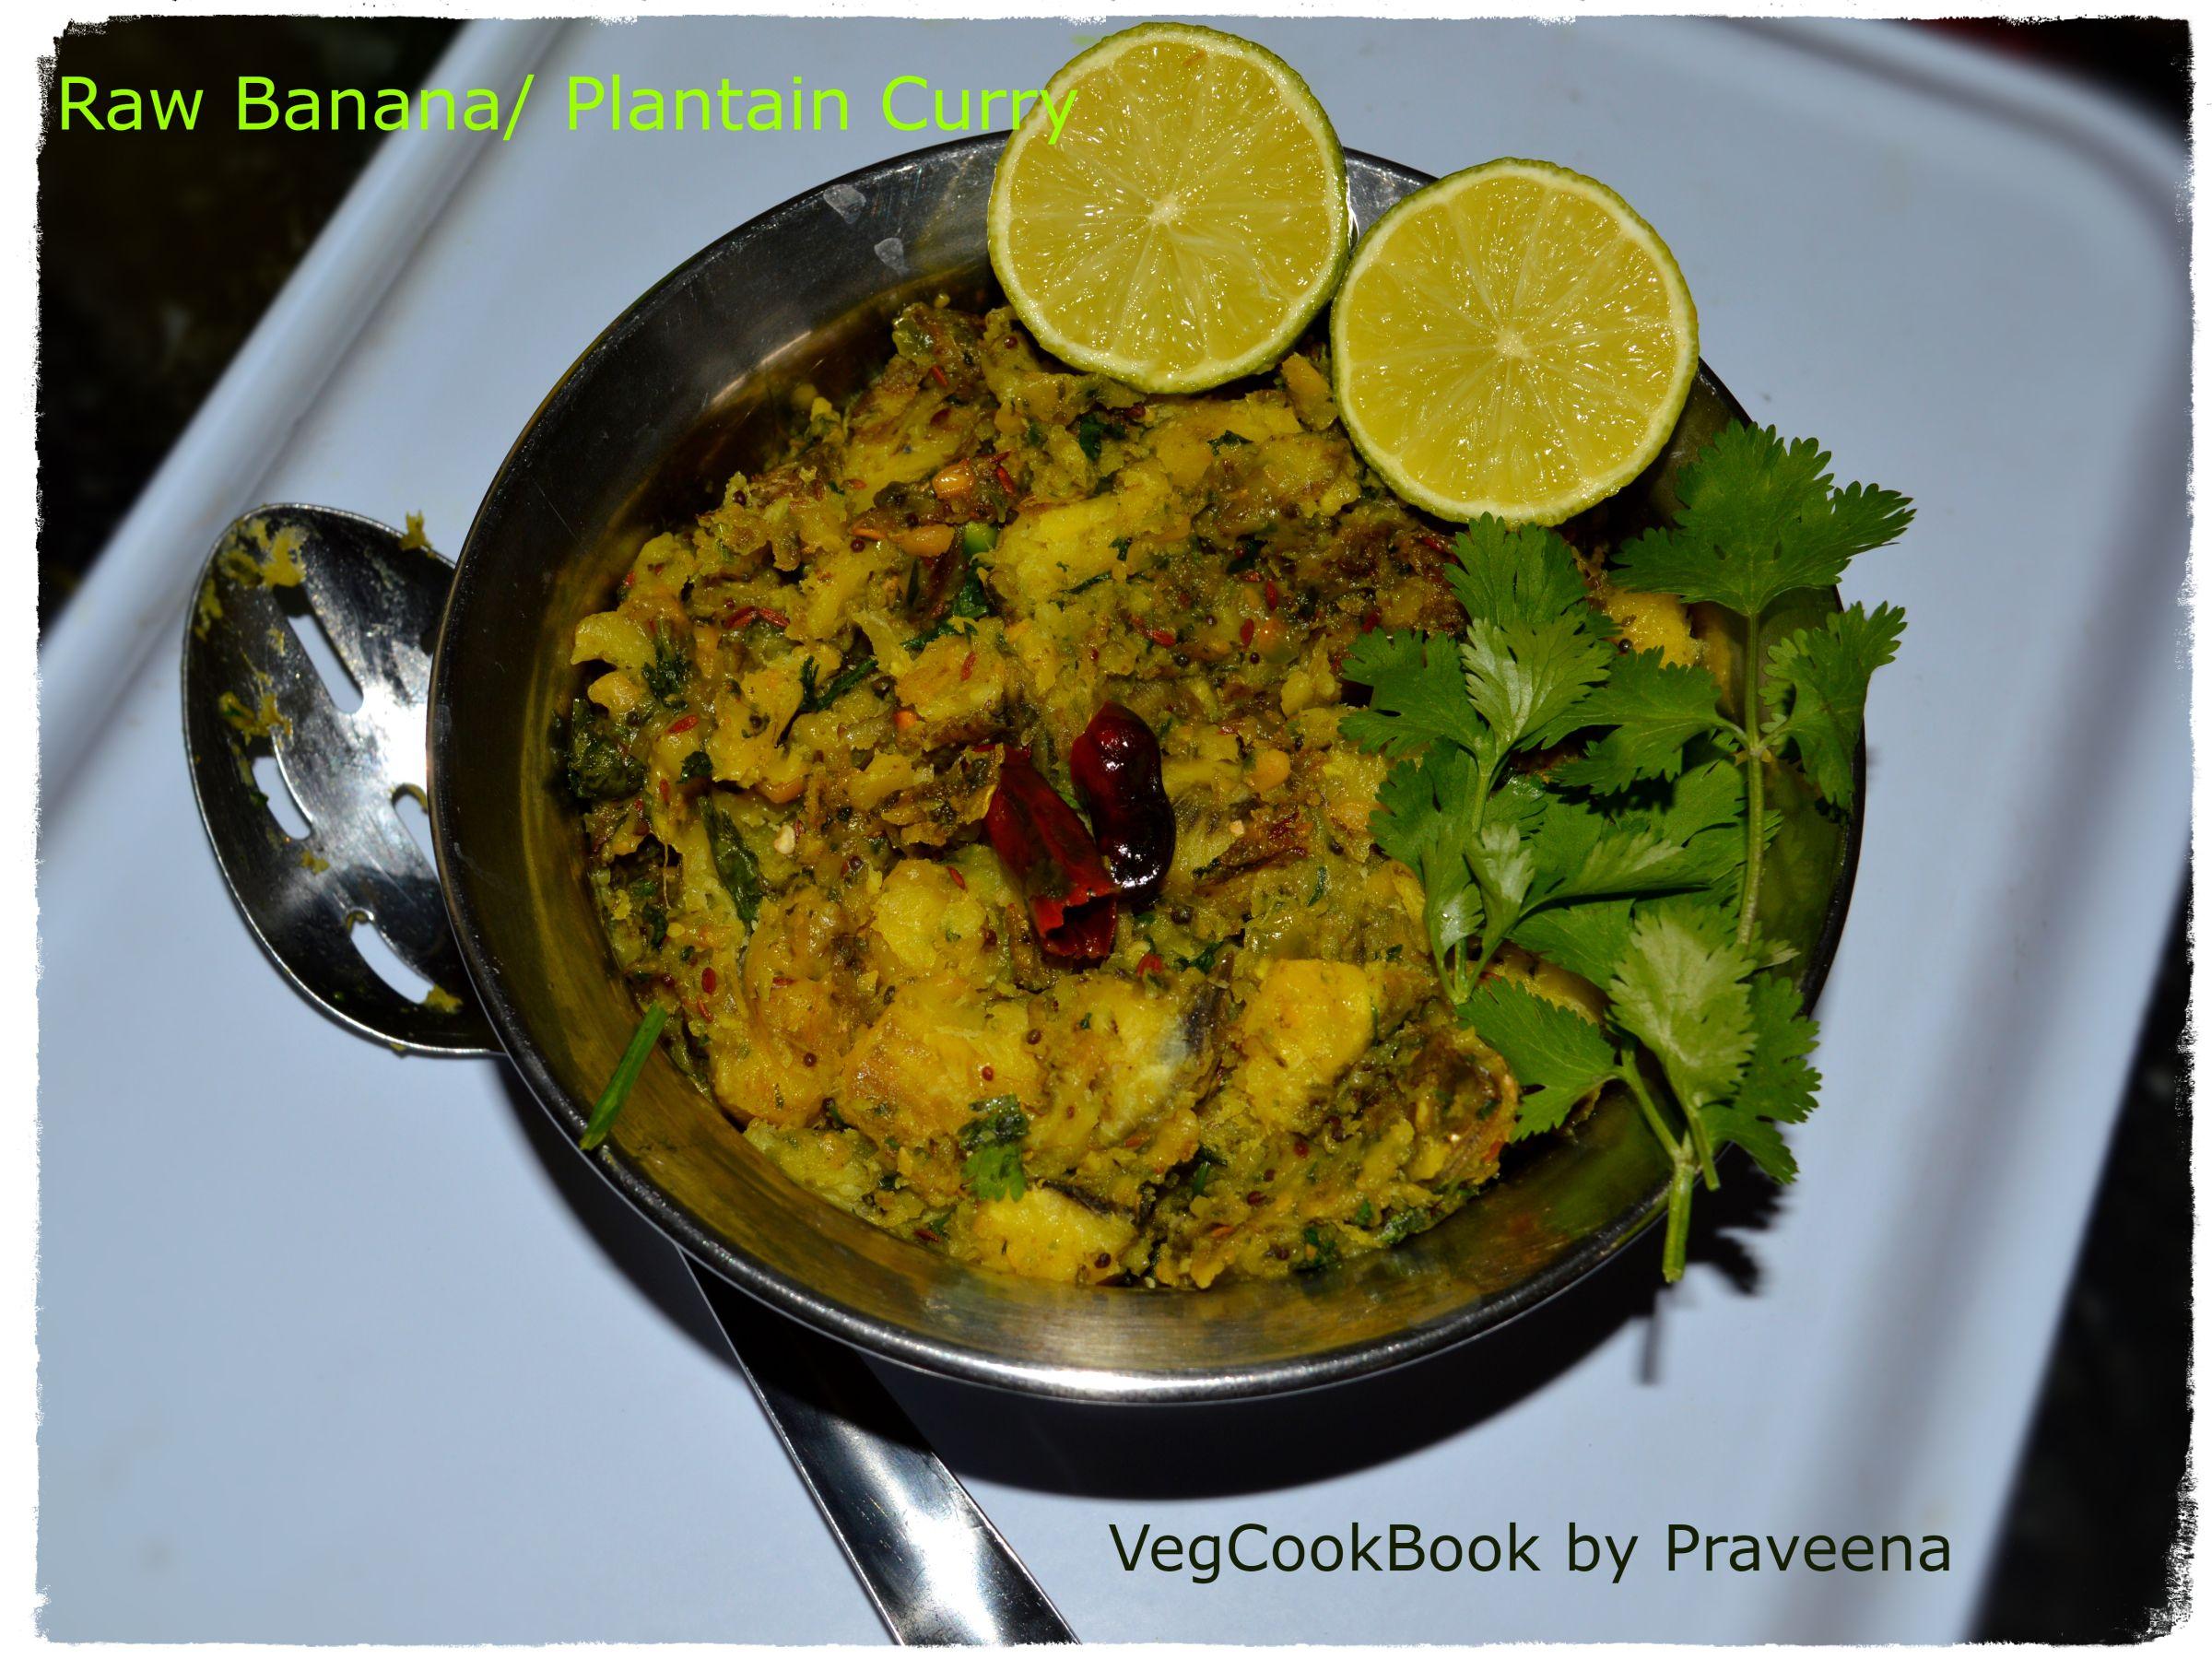 Raw Banana Curry Wet Aratikaya Muddha Koora Vegcookbook By Praveena Raw Banana Banana Curry Indian Food Recipes Vegetarian